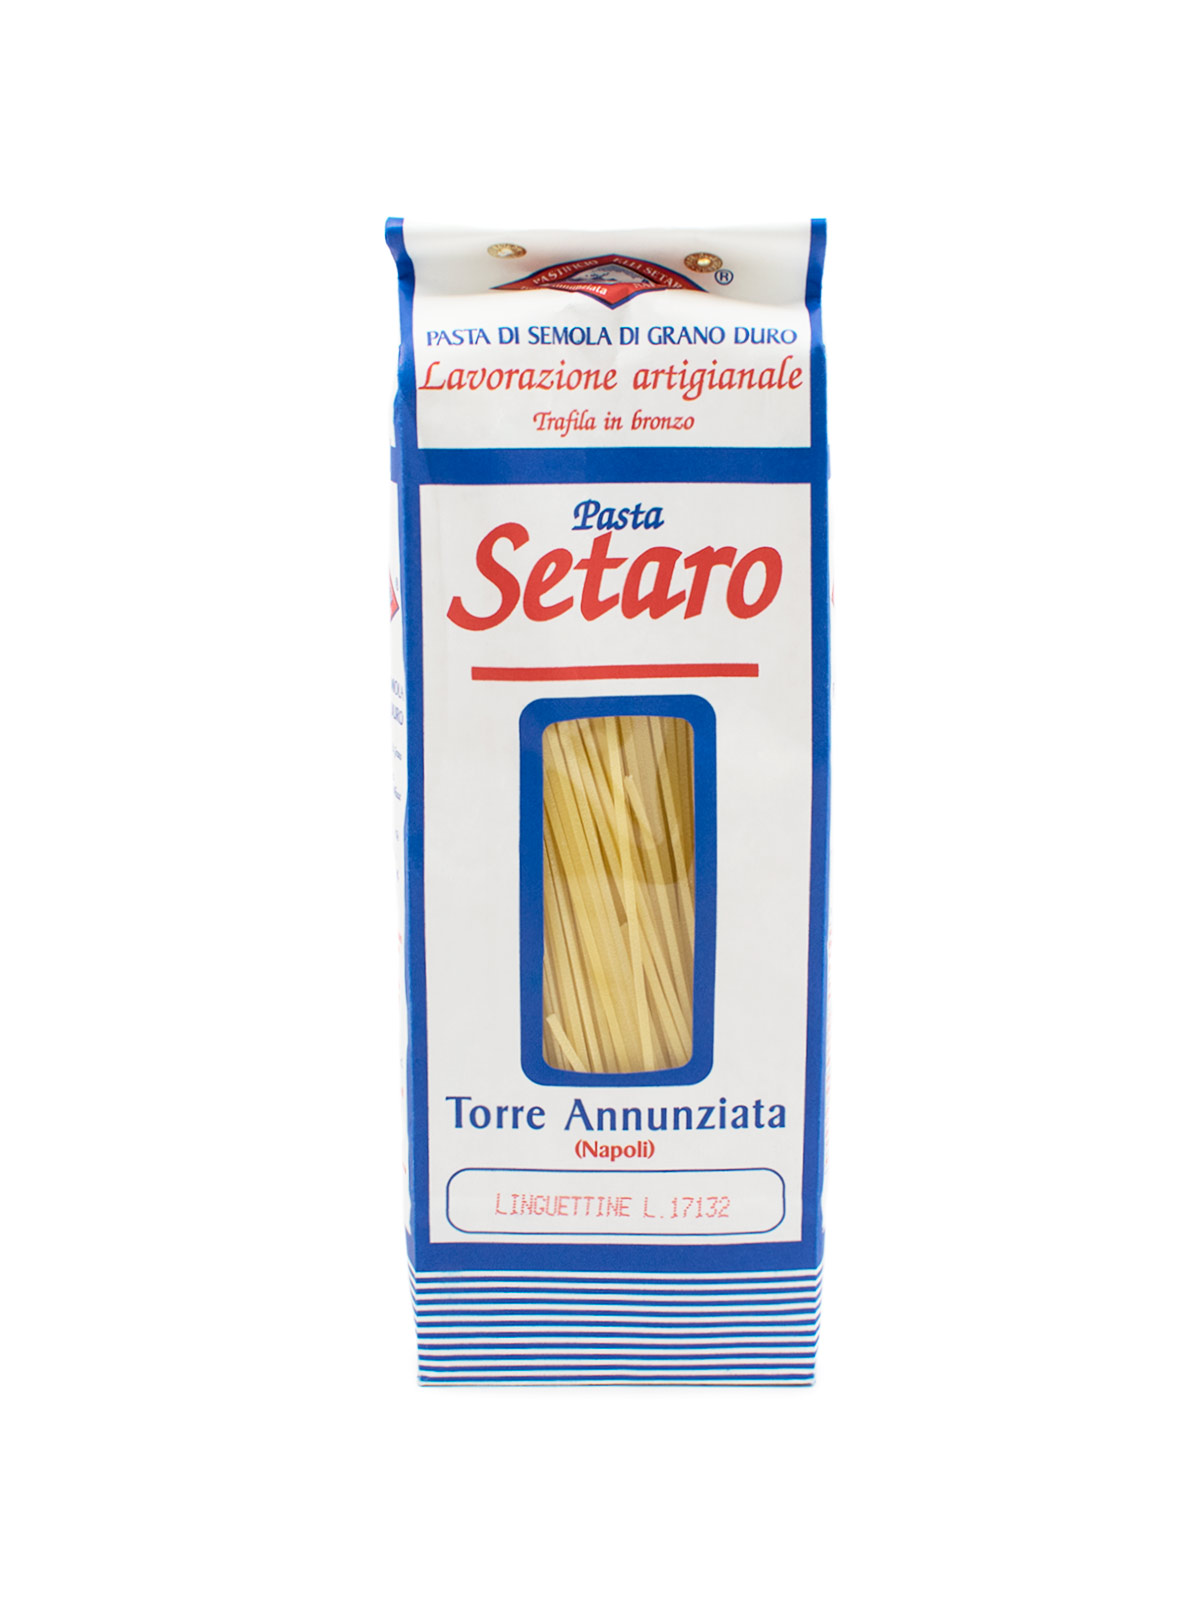 Linguettine - Pastas, Rice, and Grains - Buon'Italia